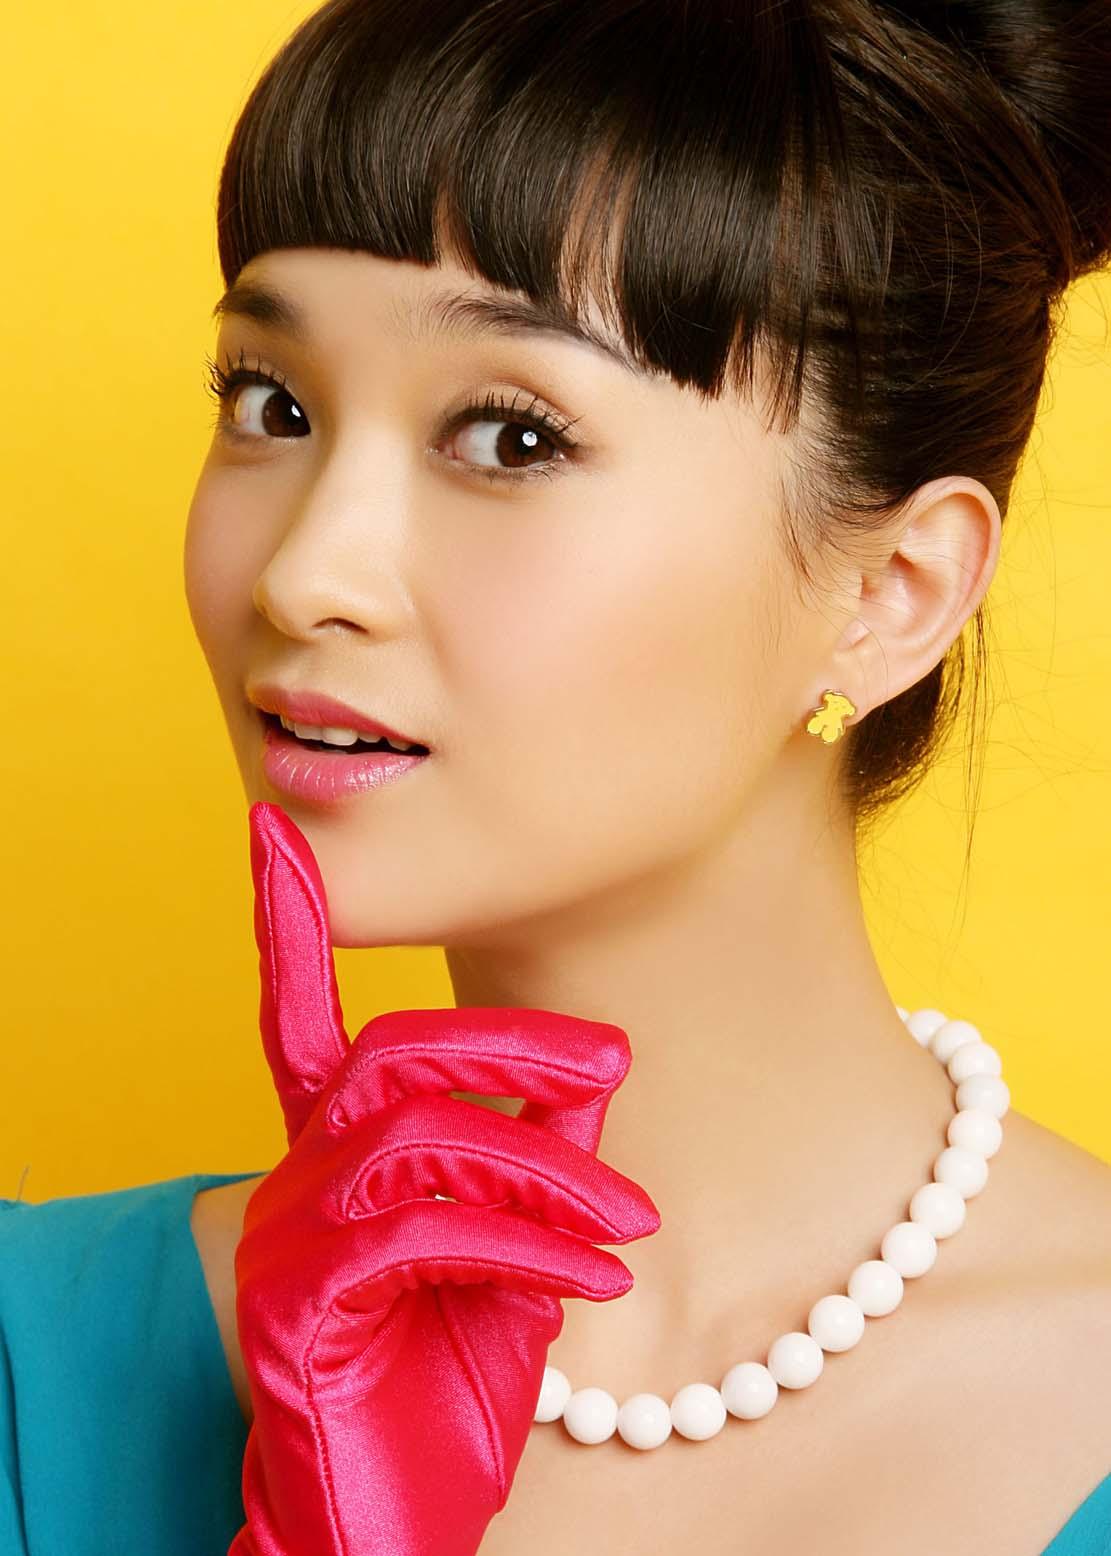 Asian Actresses Beautiful Chinese Hot Girls Hd Wallpapers -5802